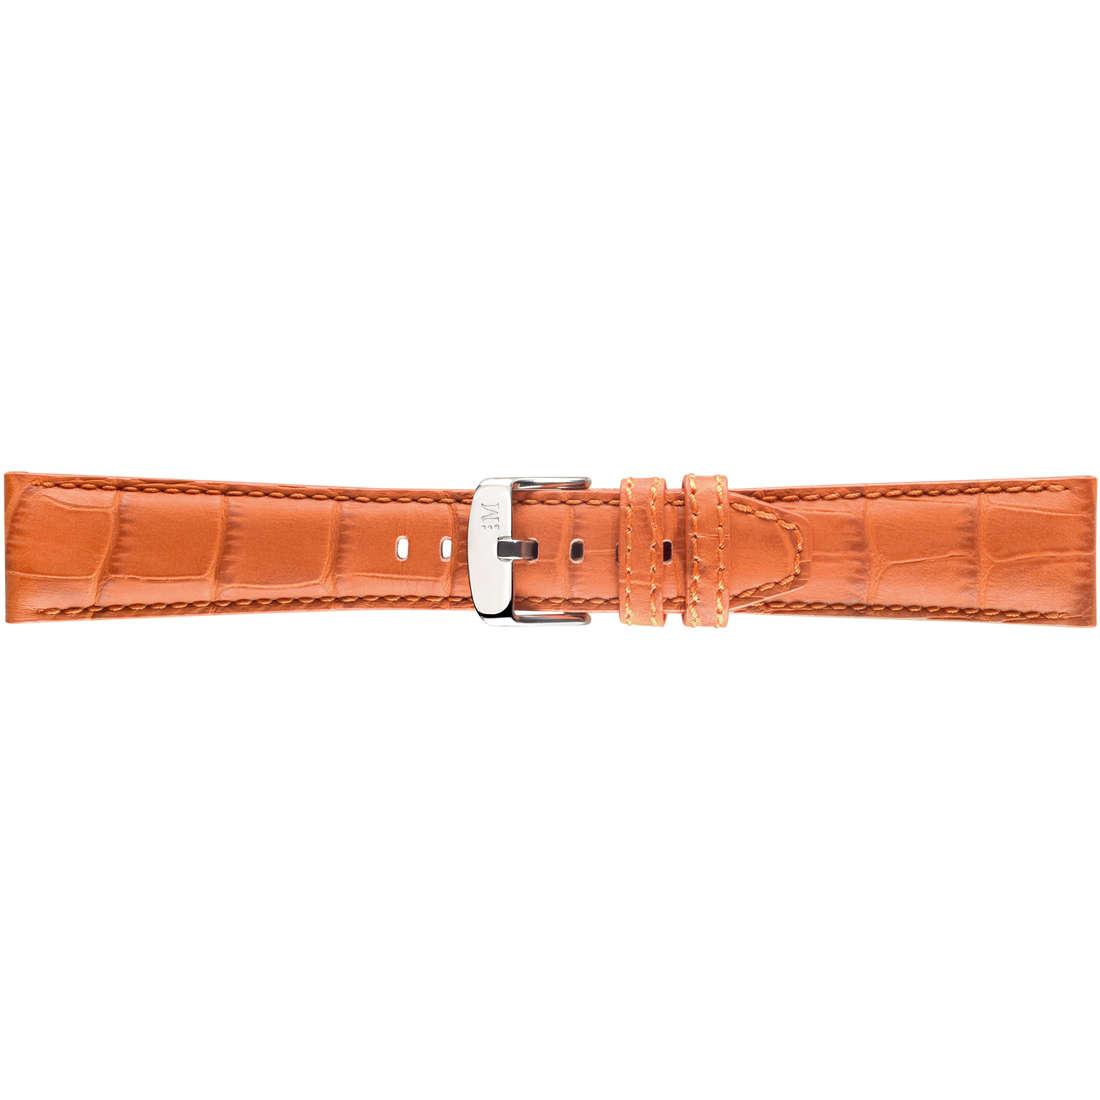 watch watch bands watch straps man Morellato Linea Sport A01X4497B44086CR20